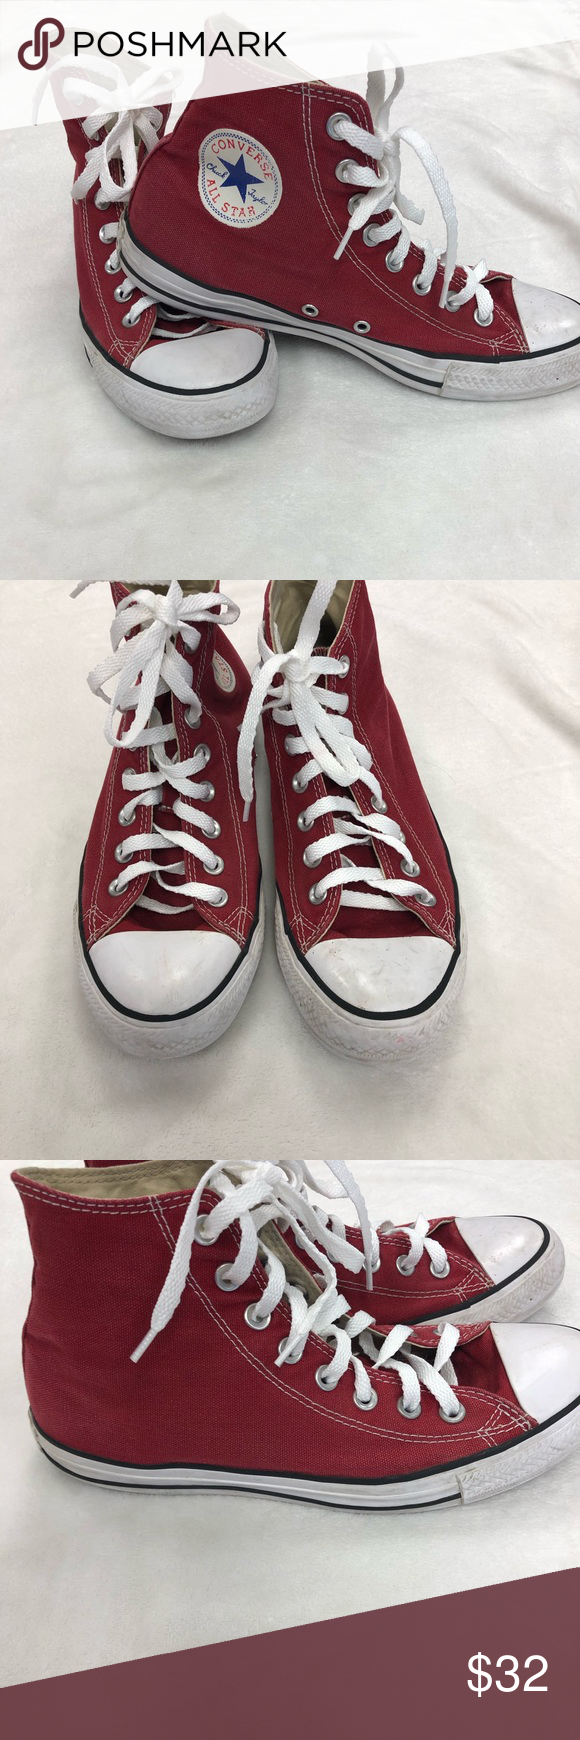 0cc0f9eea3ab Converse All star high tops size 9 burgundy Converse Chuck Taylor All star  high top shoes